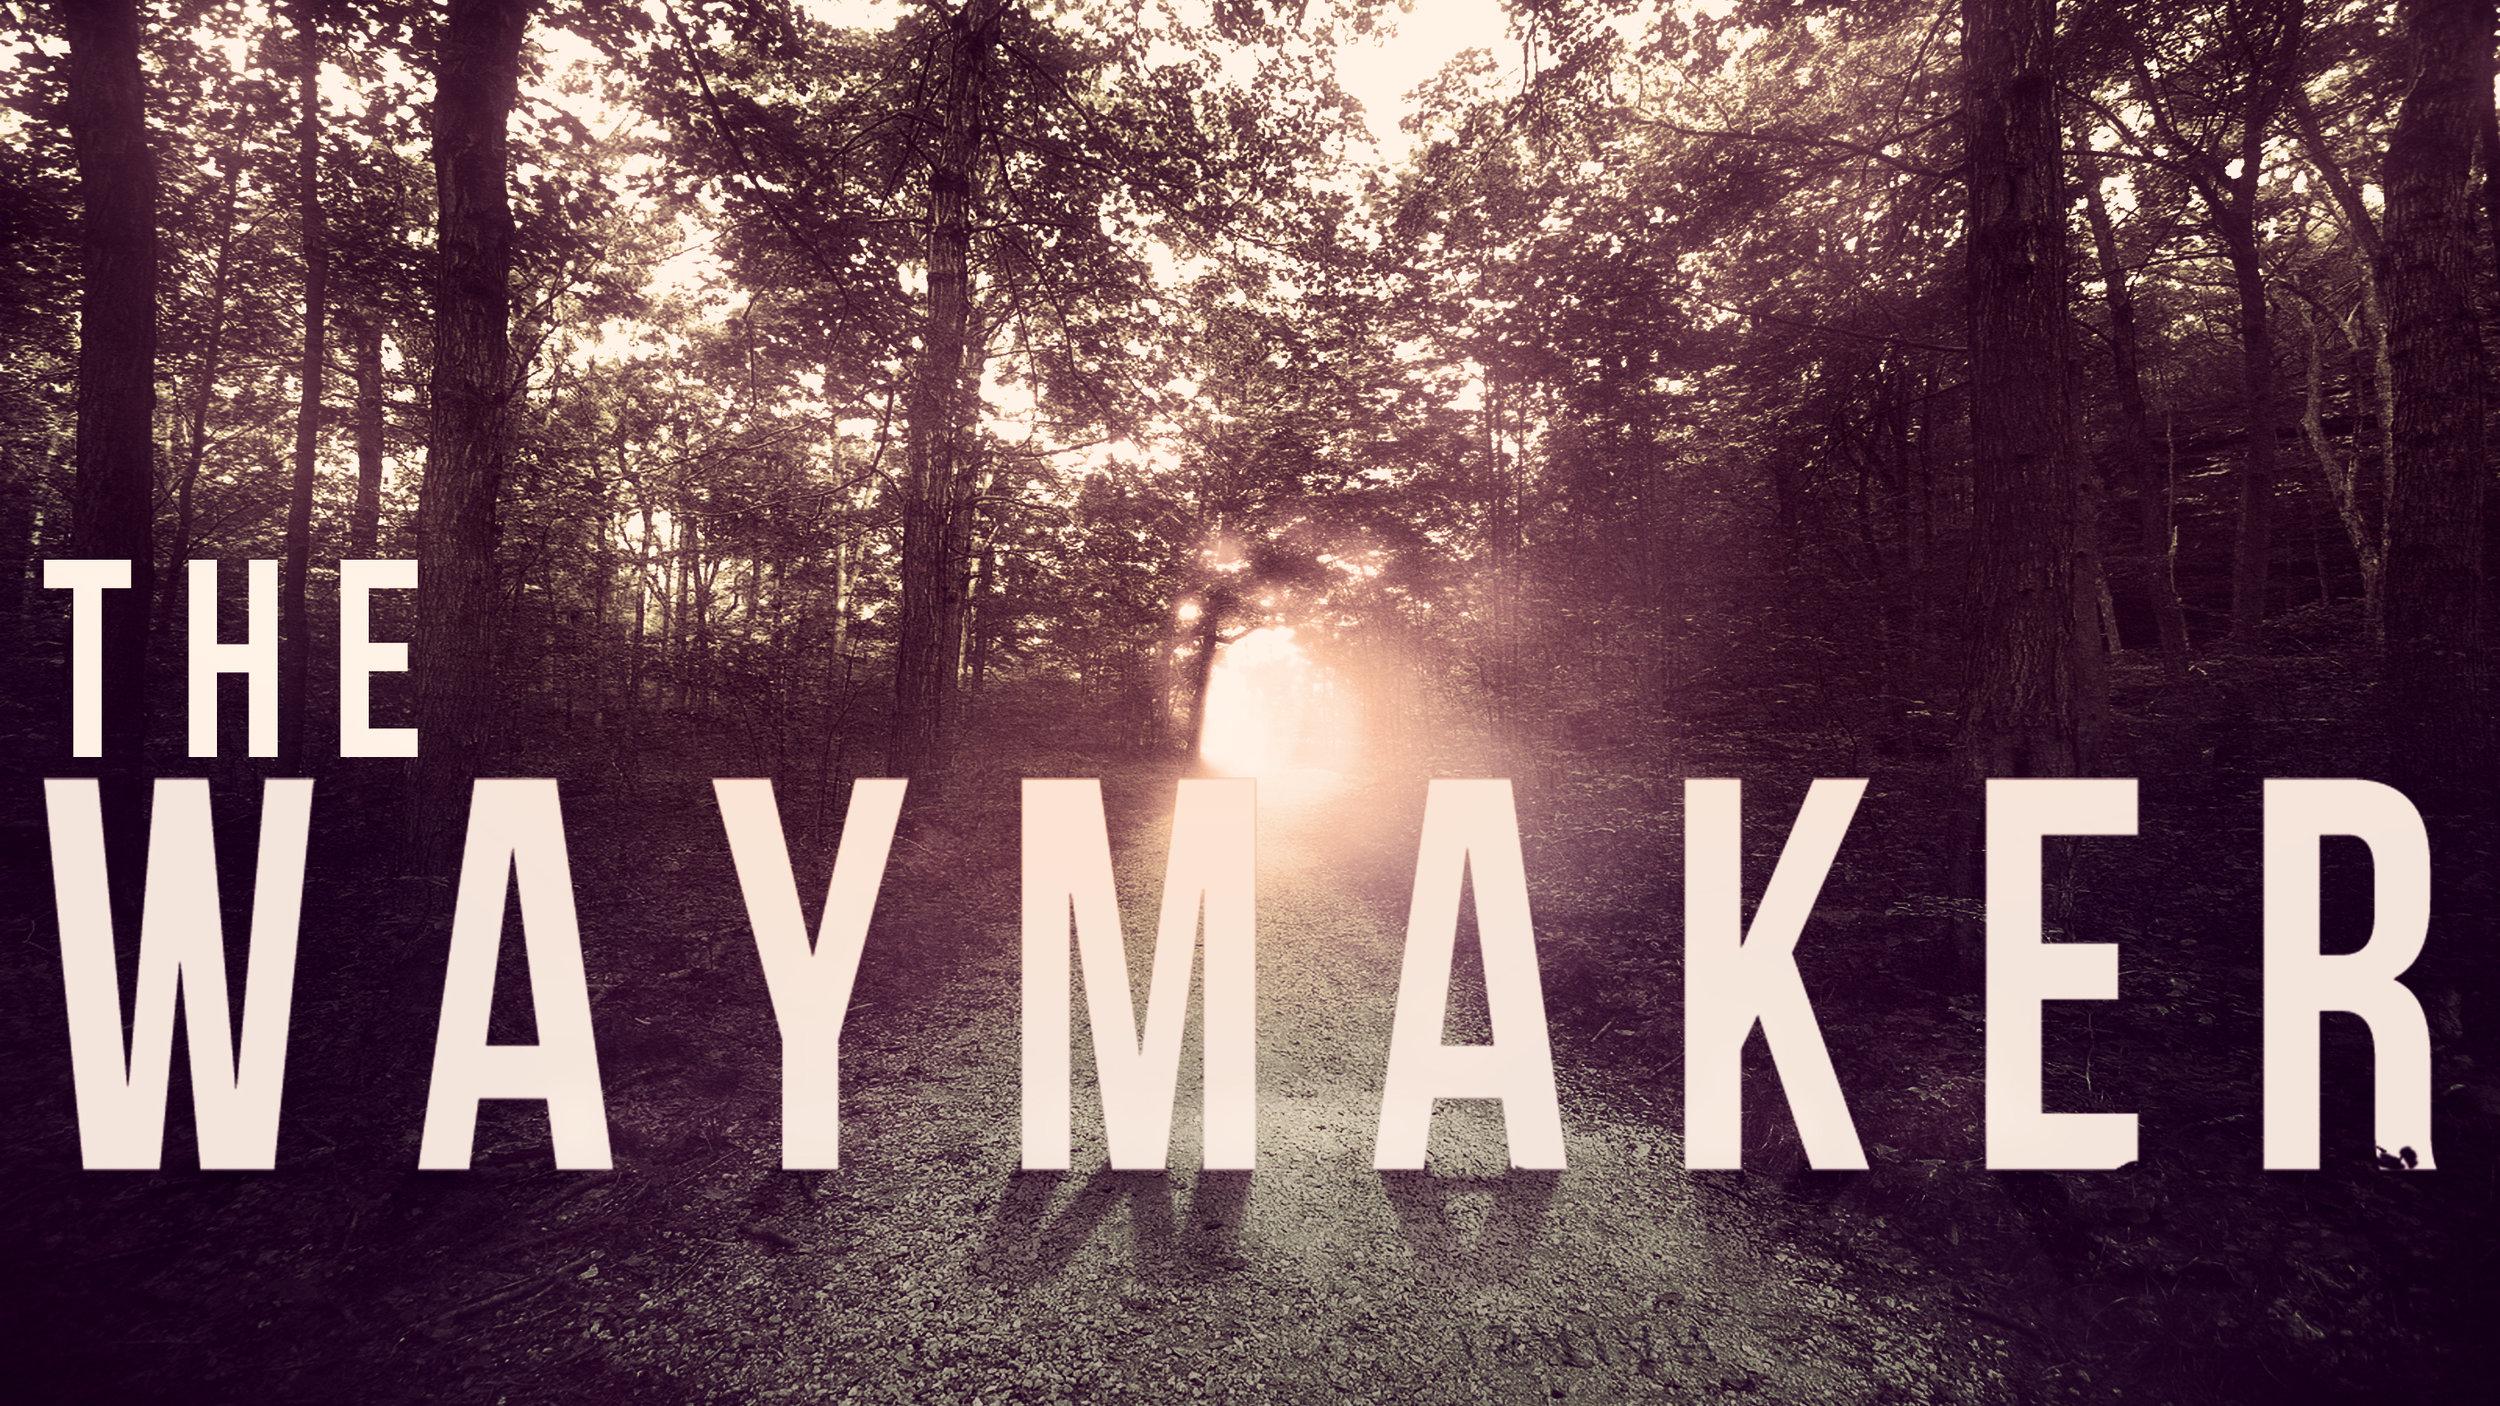 WAYMAKER_SCREEN.jpg